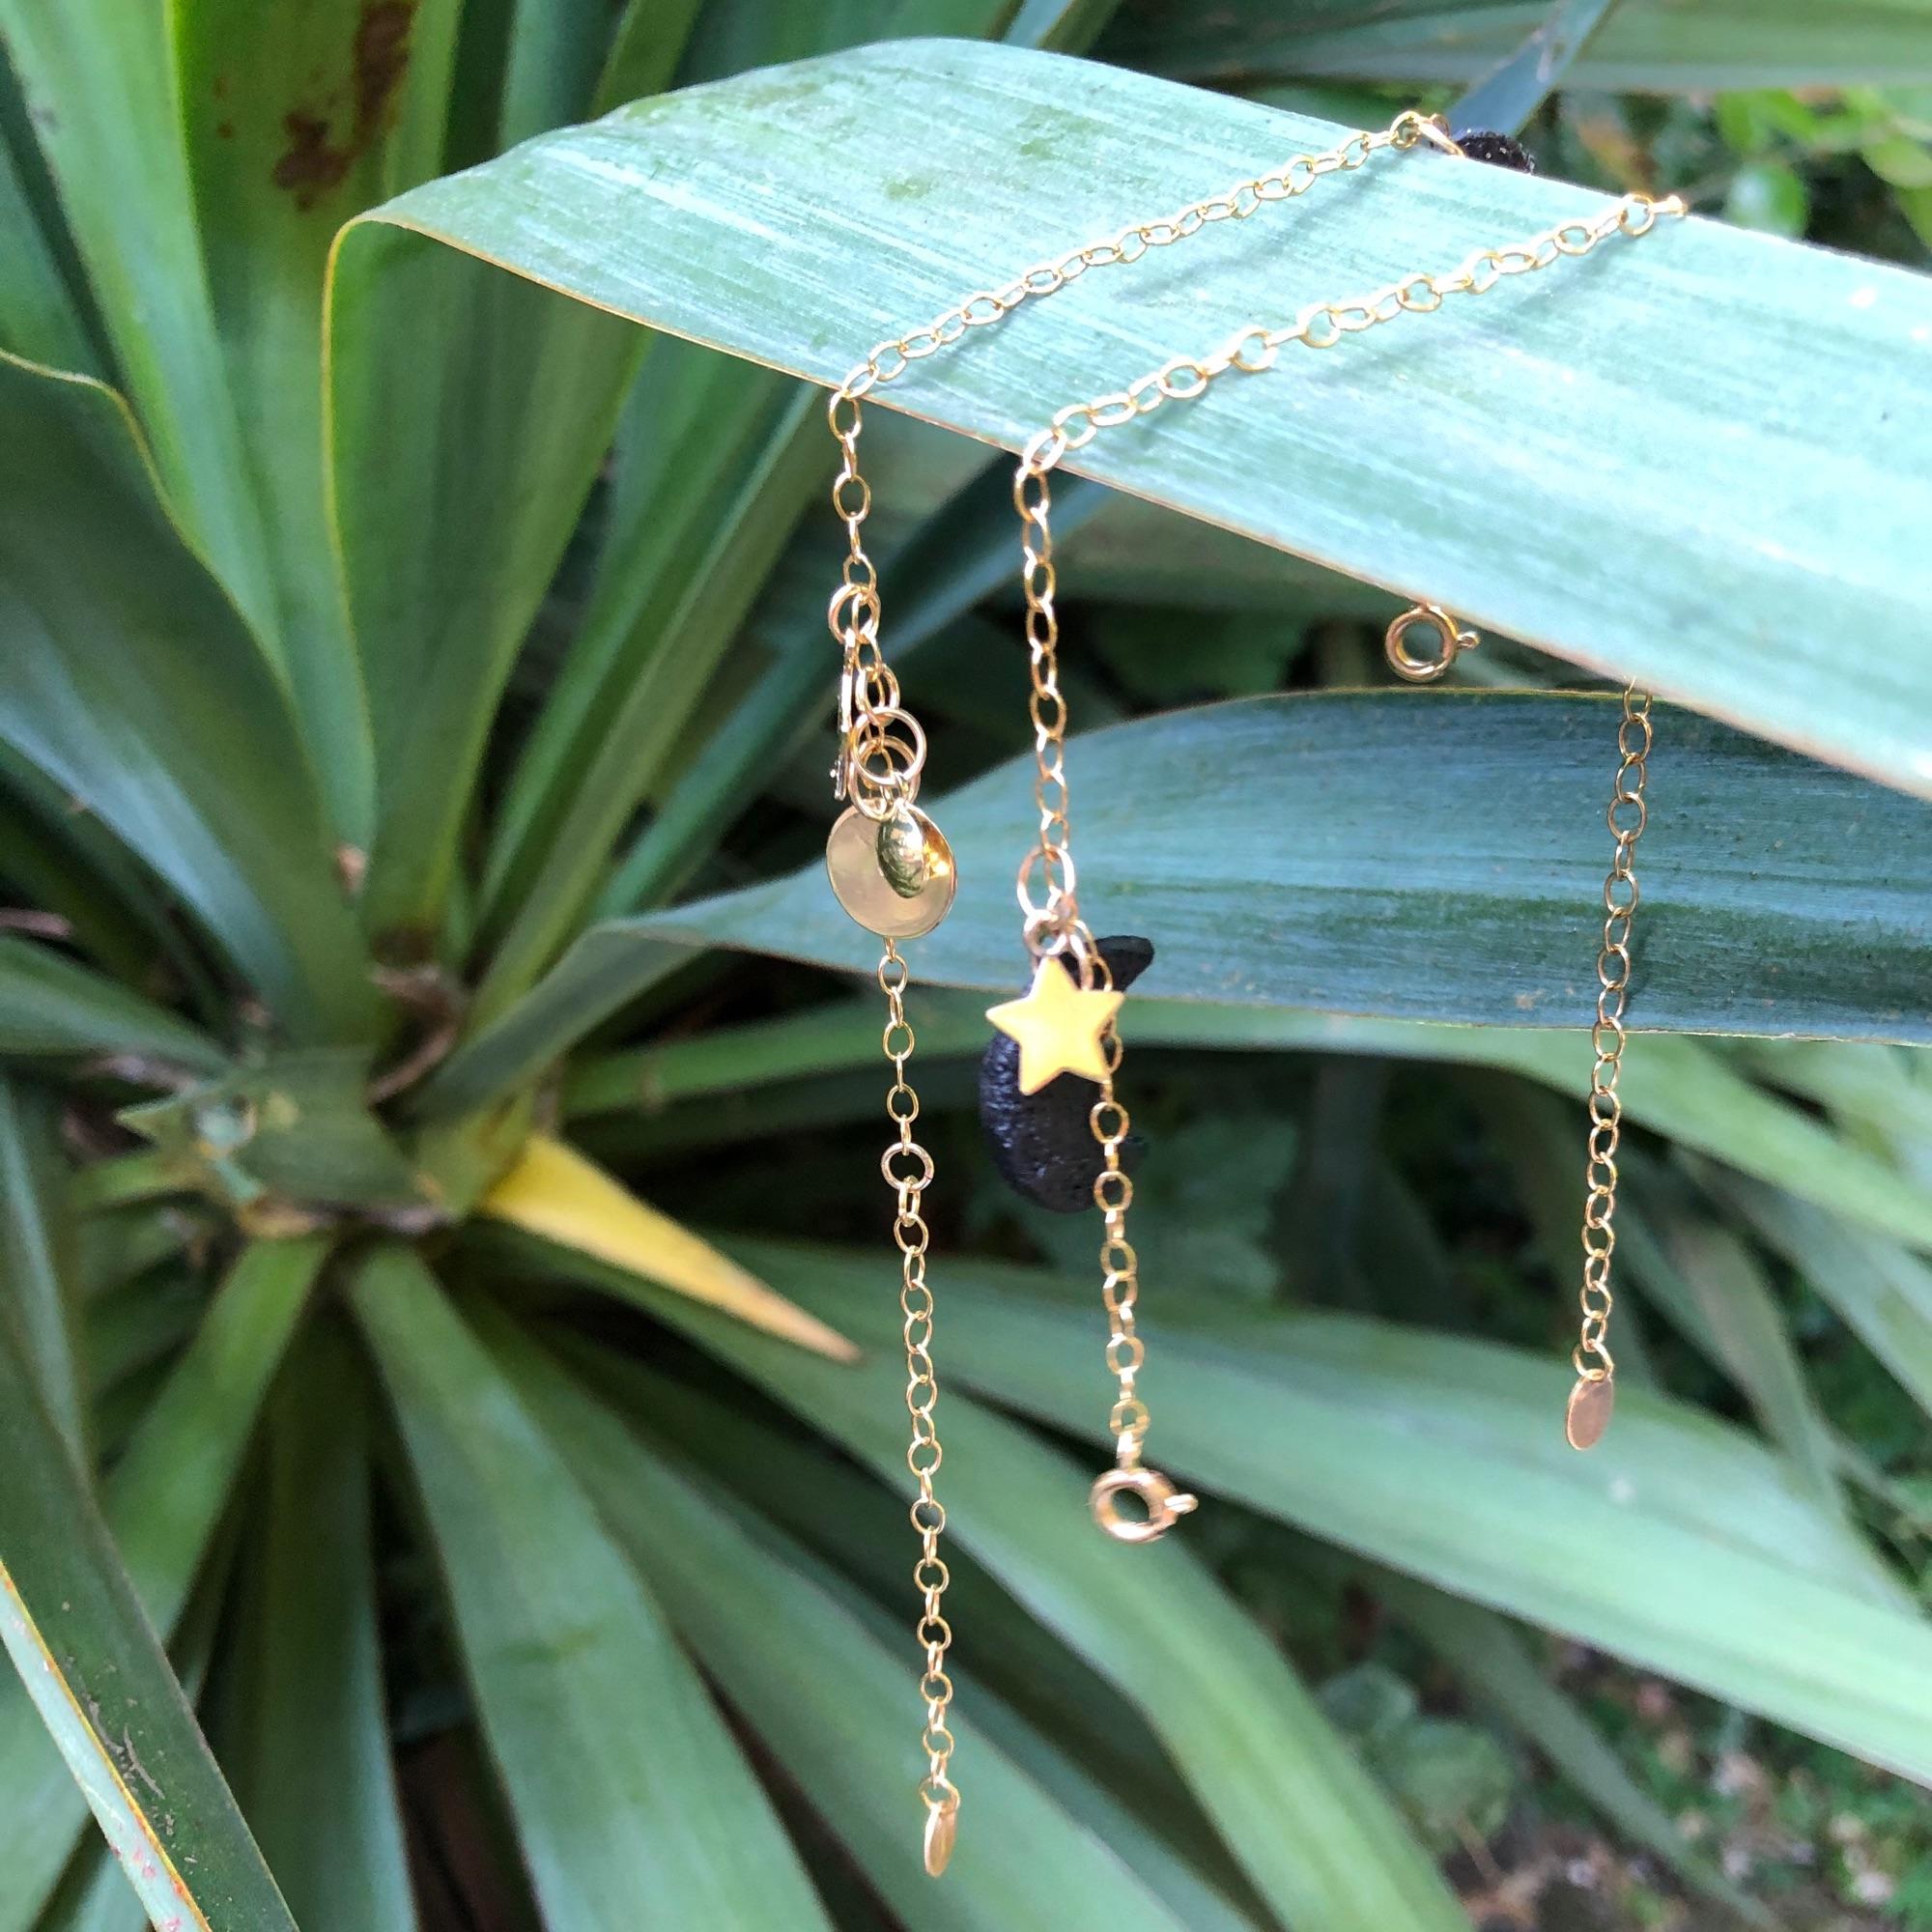 gold bracelets hanging from the leaf